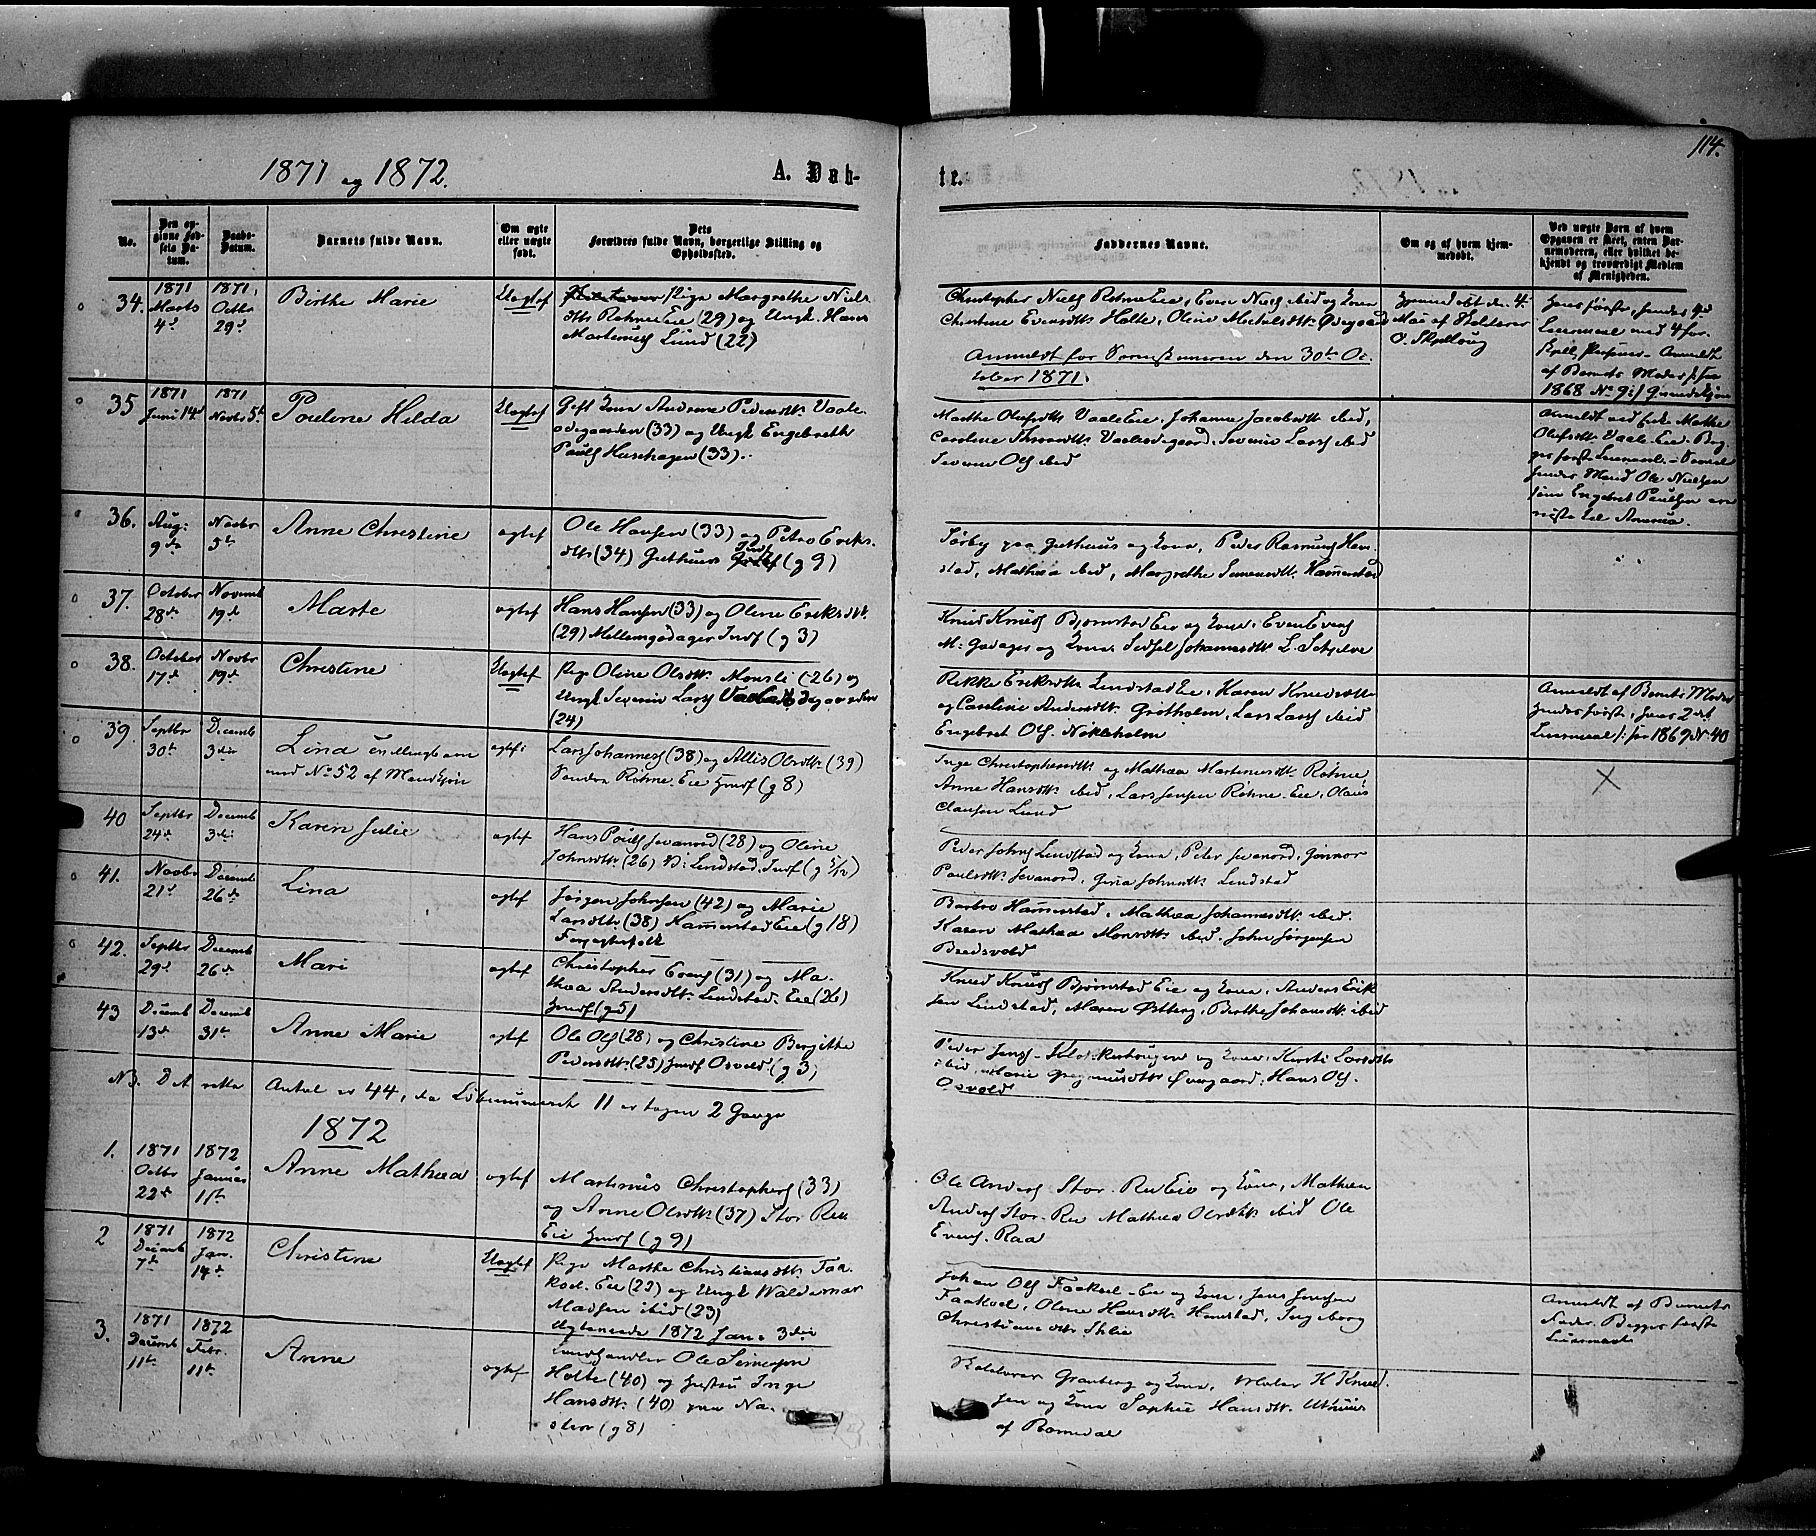 SAH, Stange prestekontor, K/L0013: Ministerialbok nr. 13, 1862-1879, s. 114